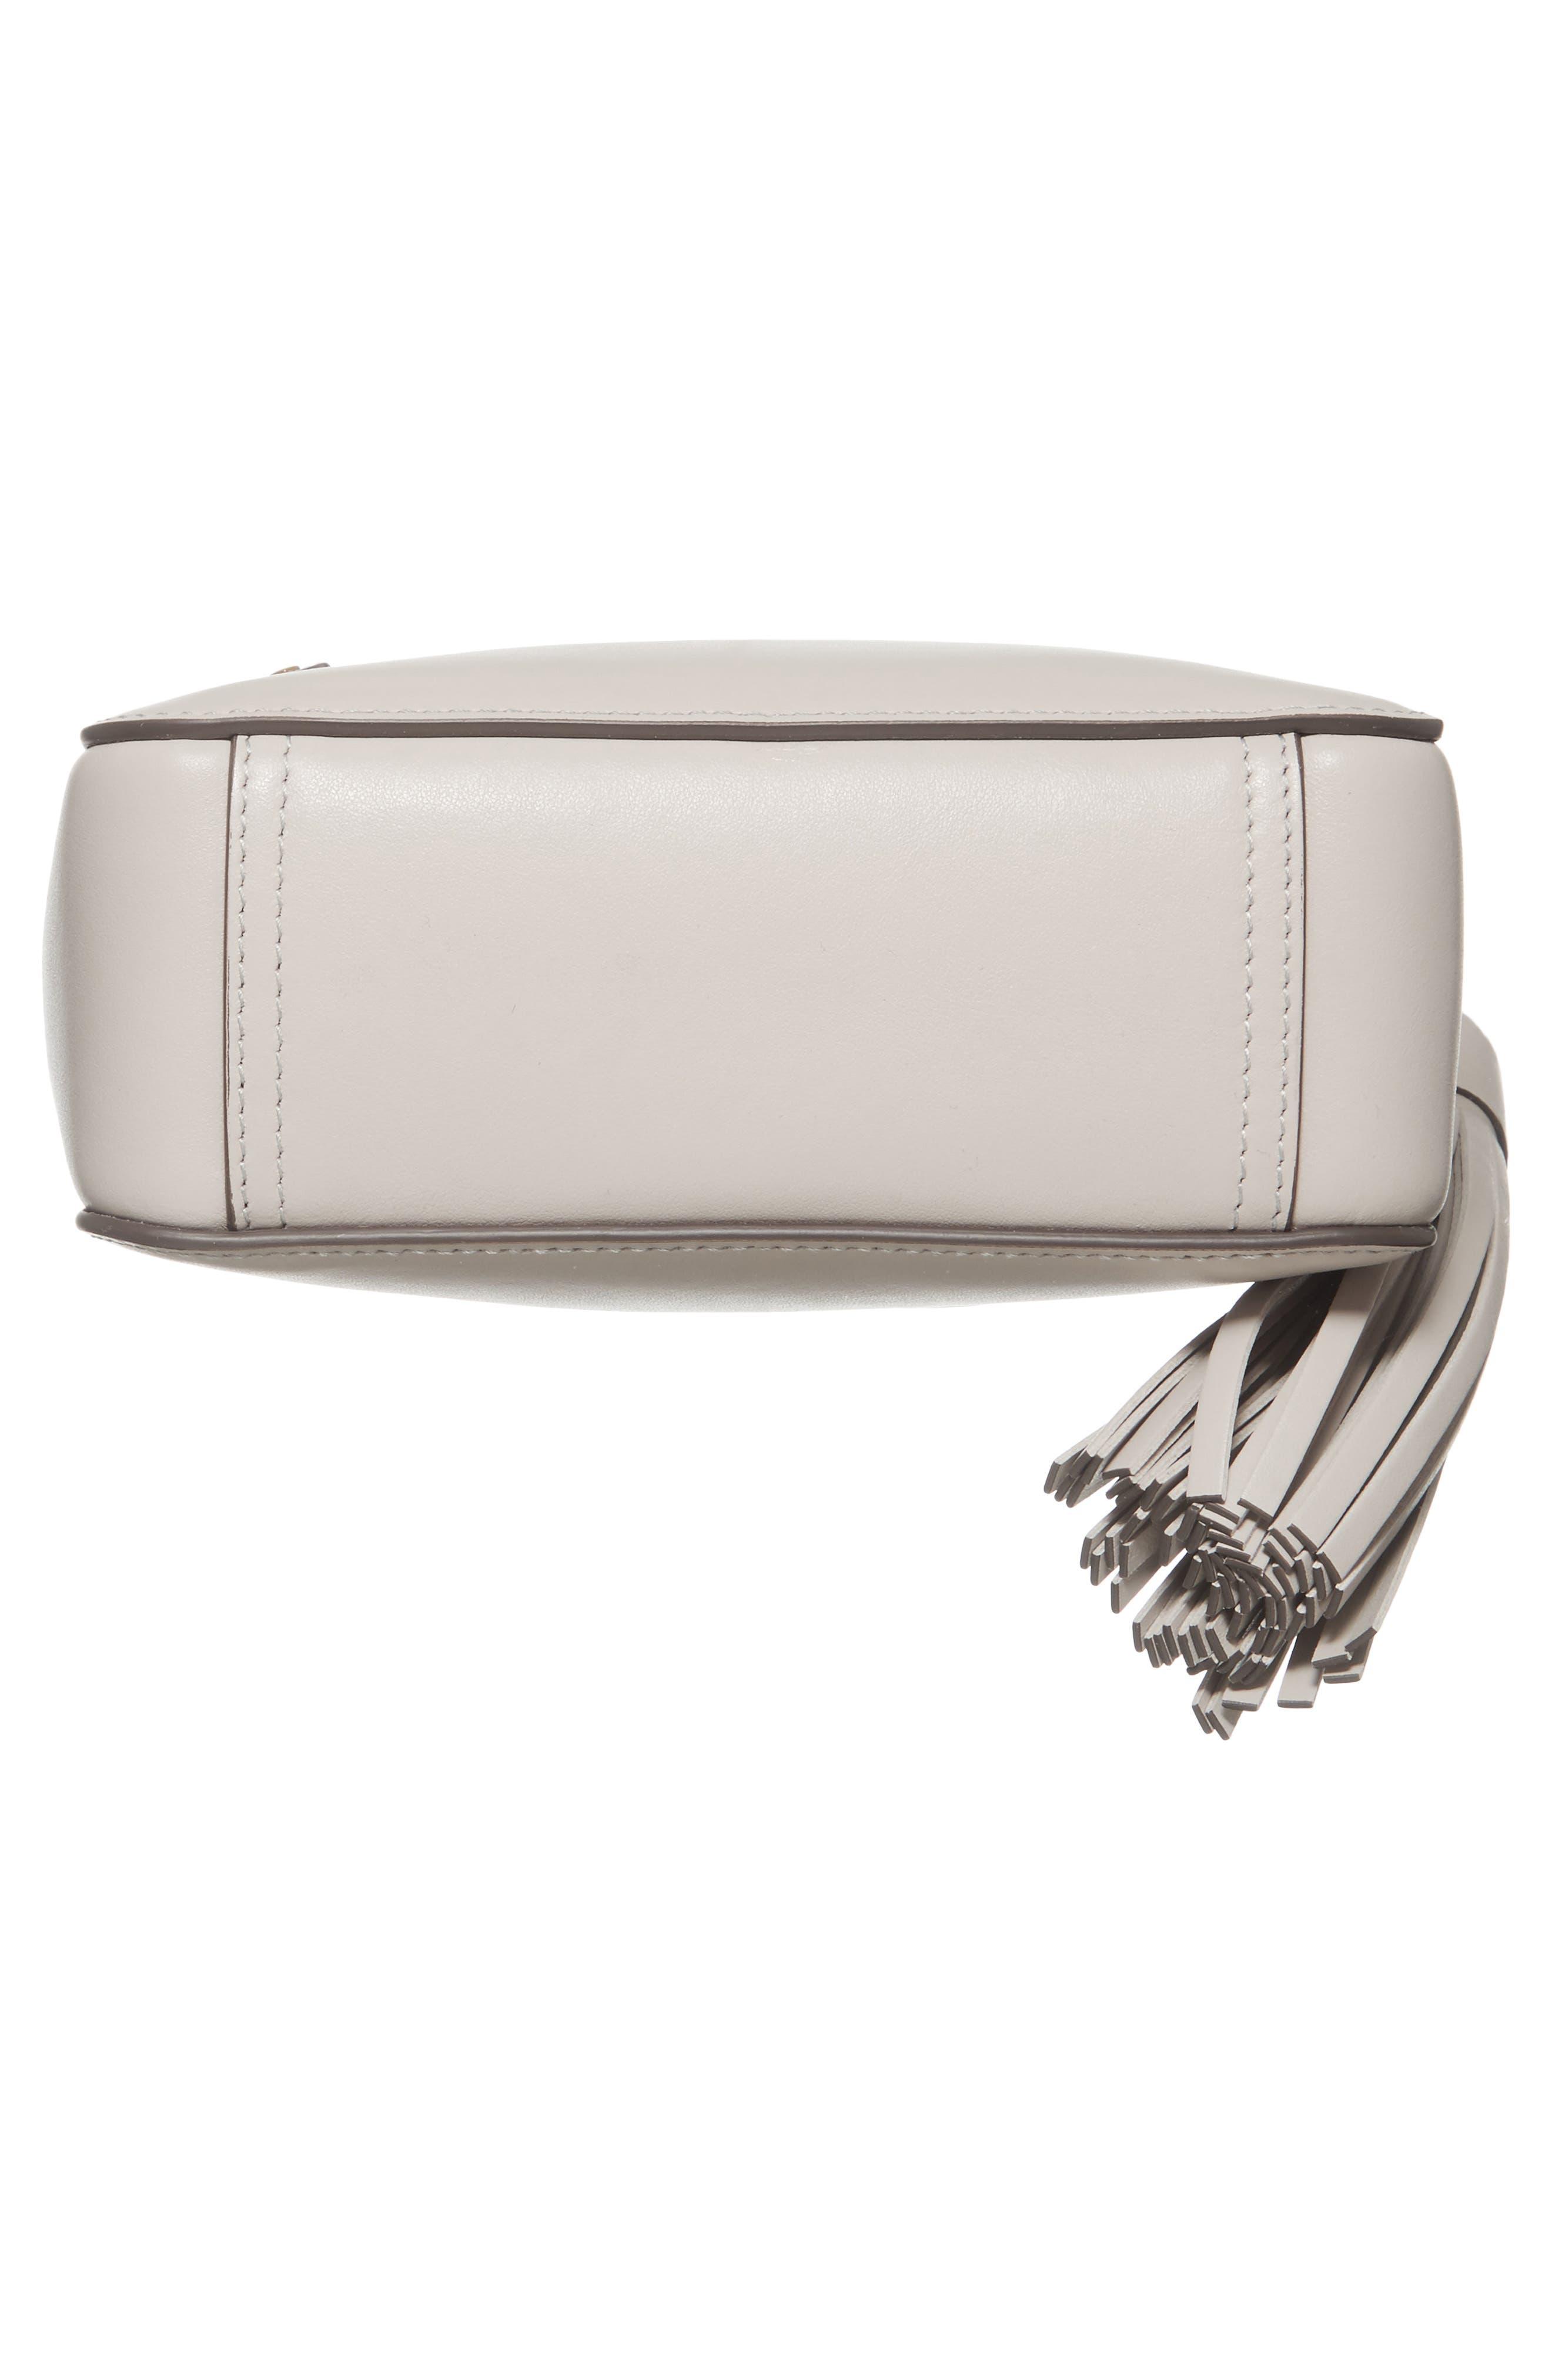 ANYA HINDMARCH,                             Eyes Leather Crossbody Bag,                             Alternate thumbnail 6, color,                             050